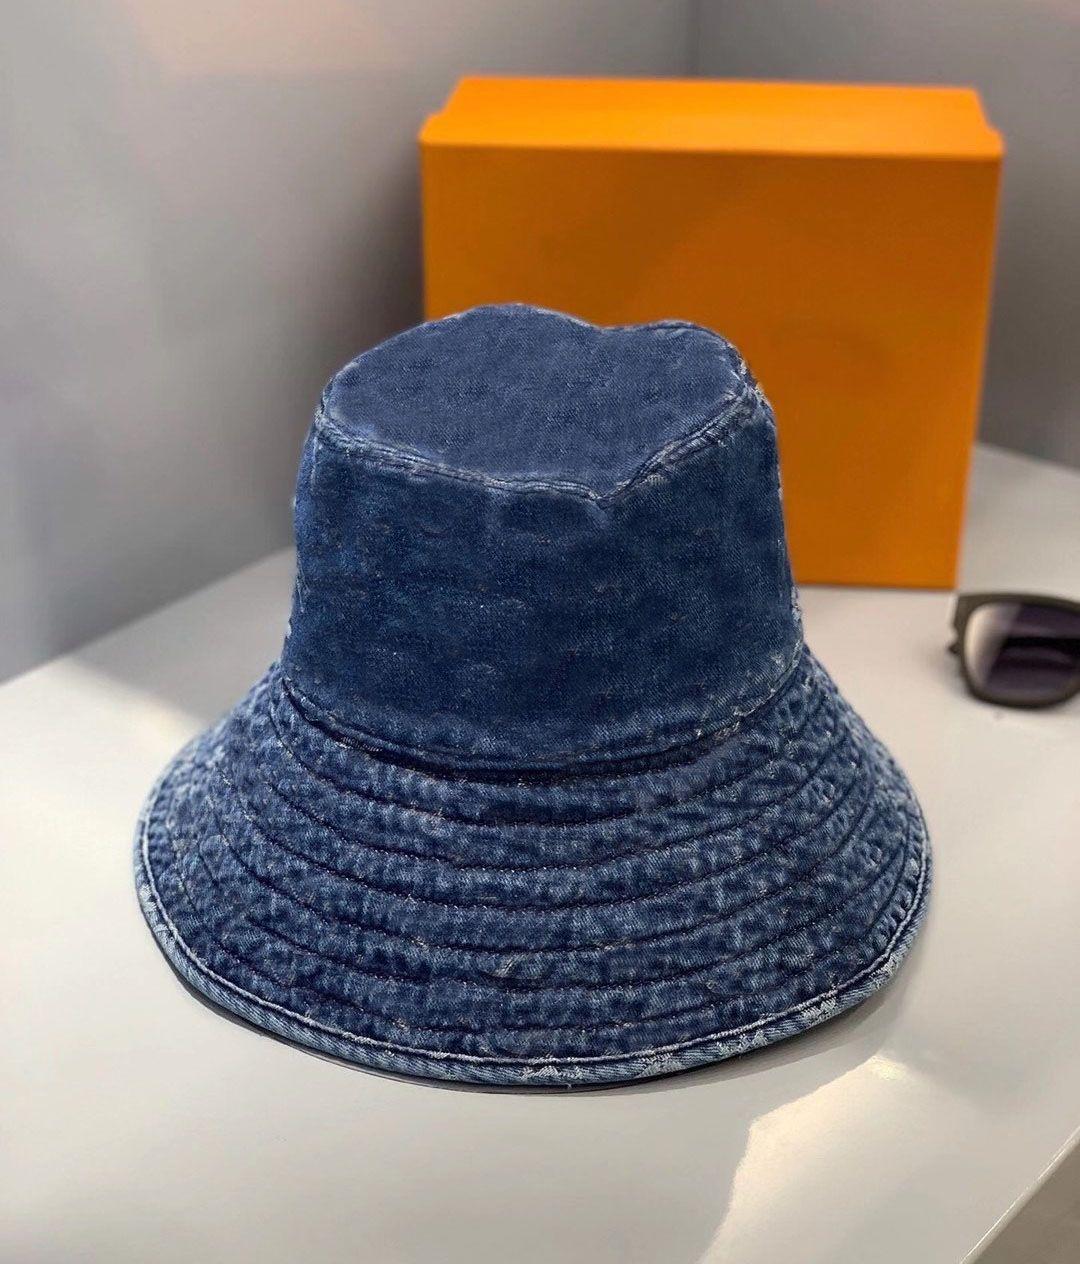 Fashion Mens and Women Bucket Hats Baseball Cap Golf Hat Snapback Beanie Skull Caps Stingy Brim Top Quality For Gift HB1213